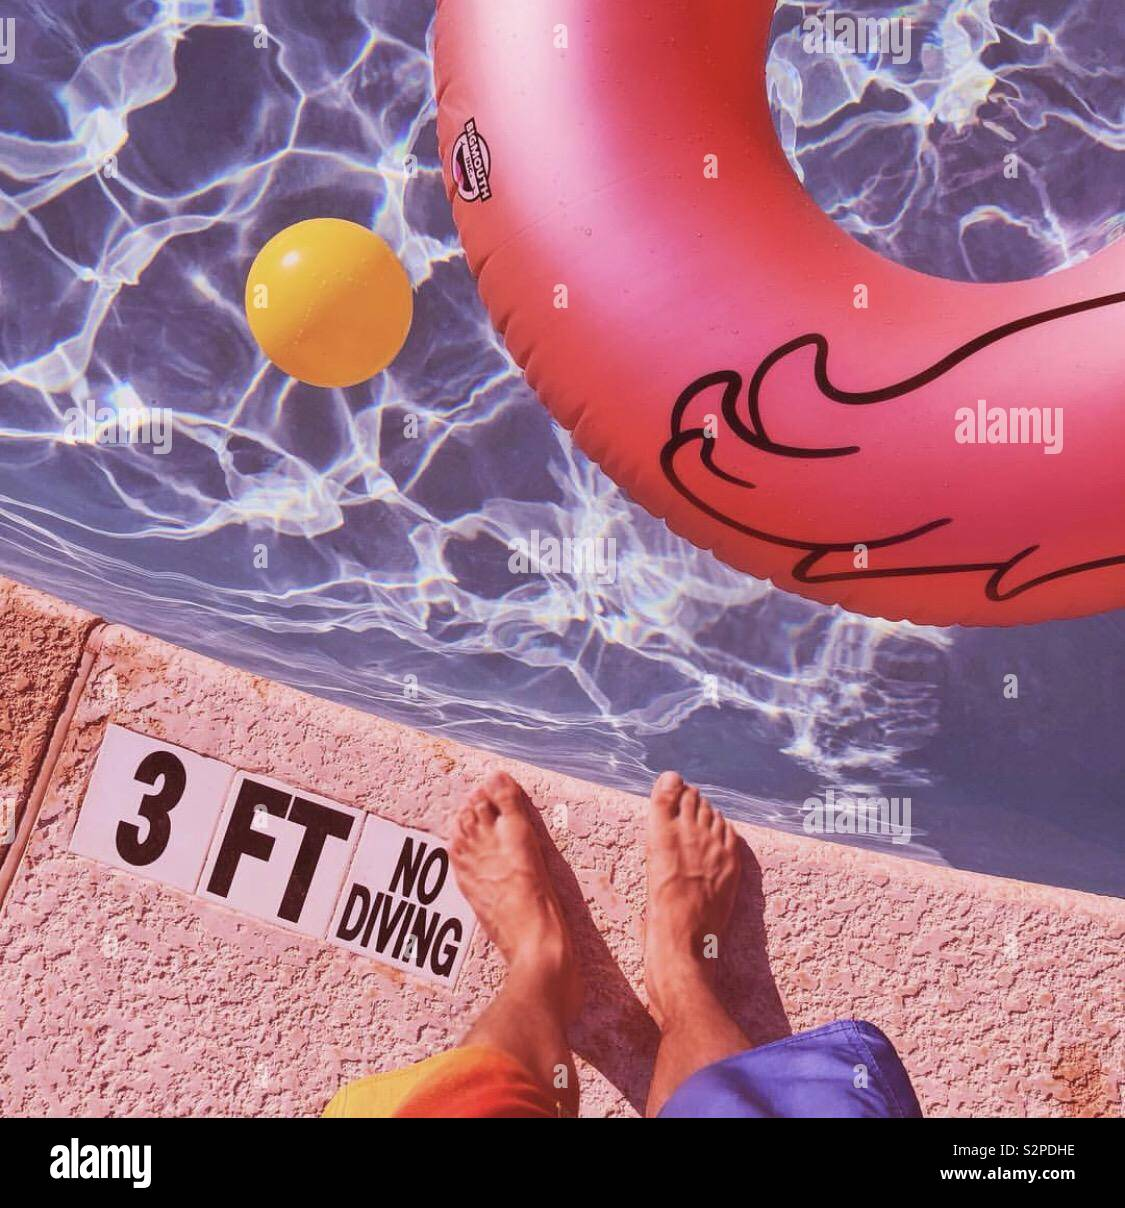 Pool Day Stock Photo